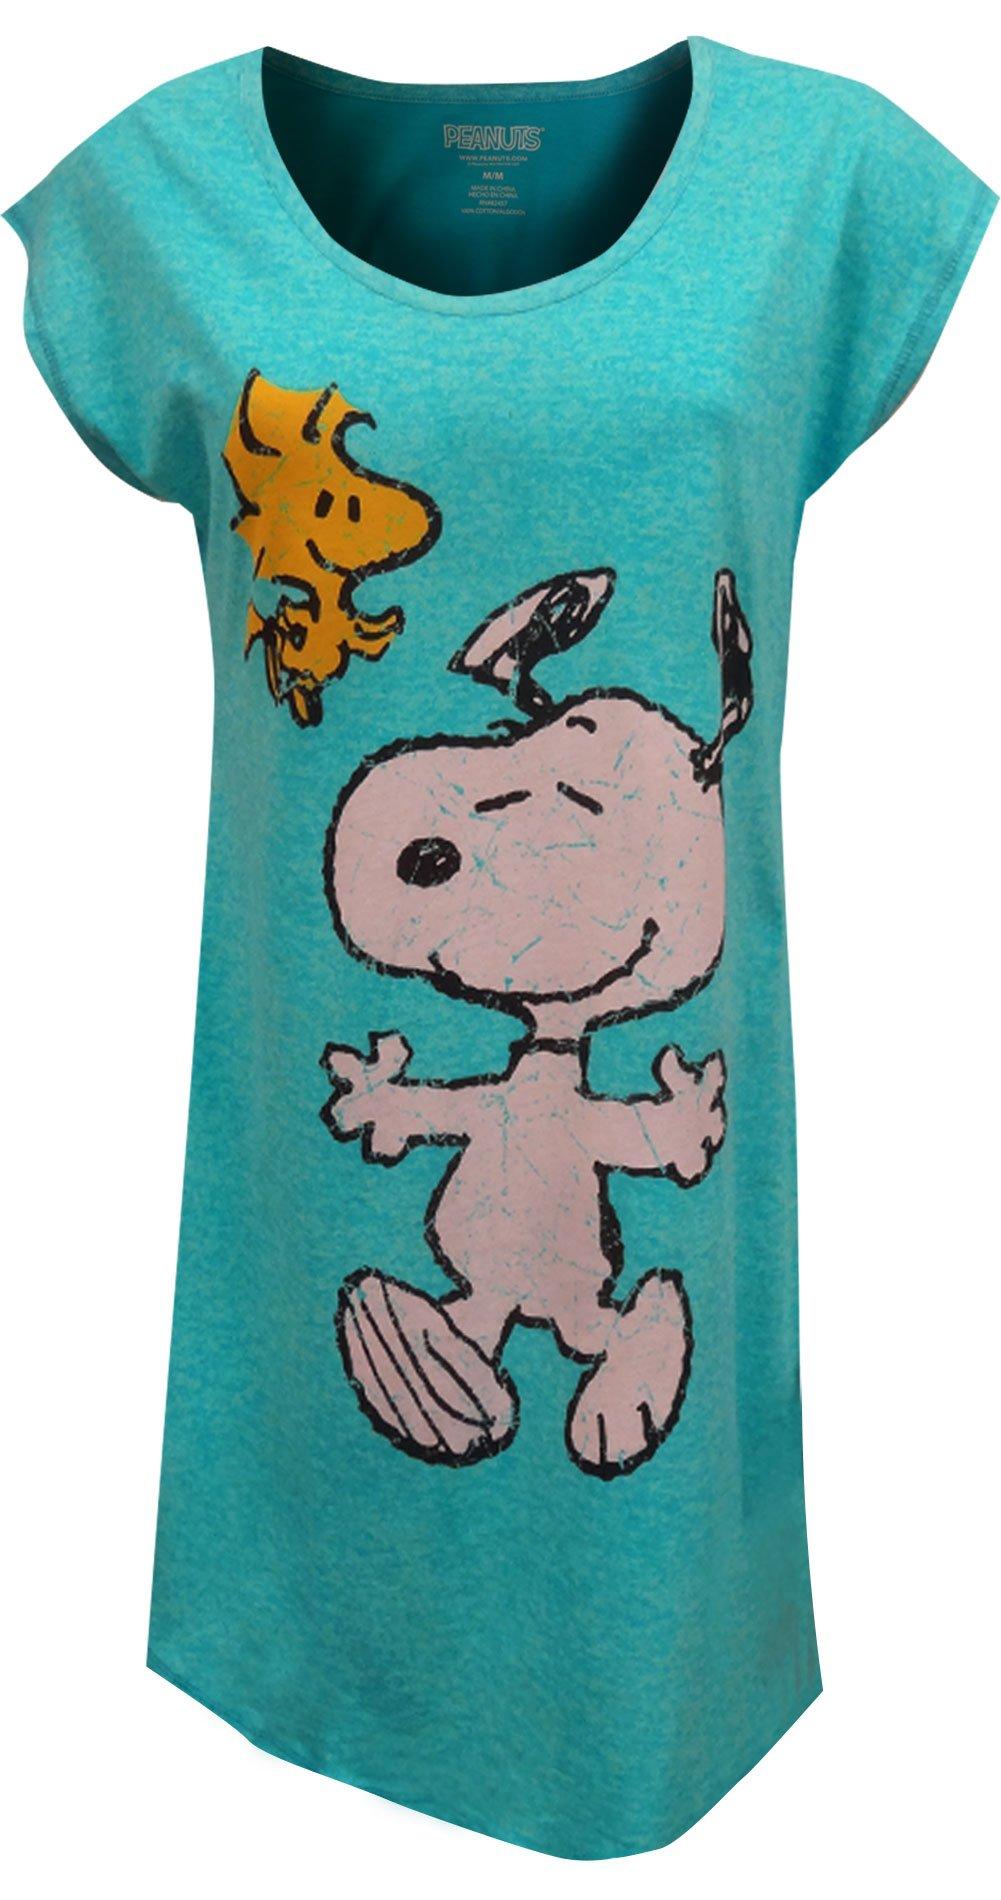 Peanuts Women's Snoopy Nightgown, Light Blue, XL